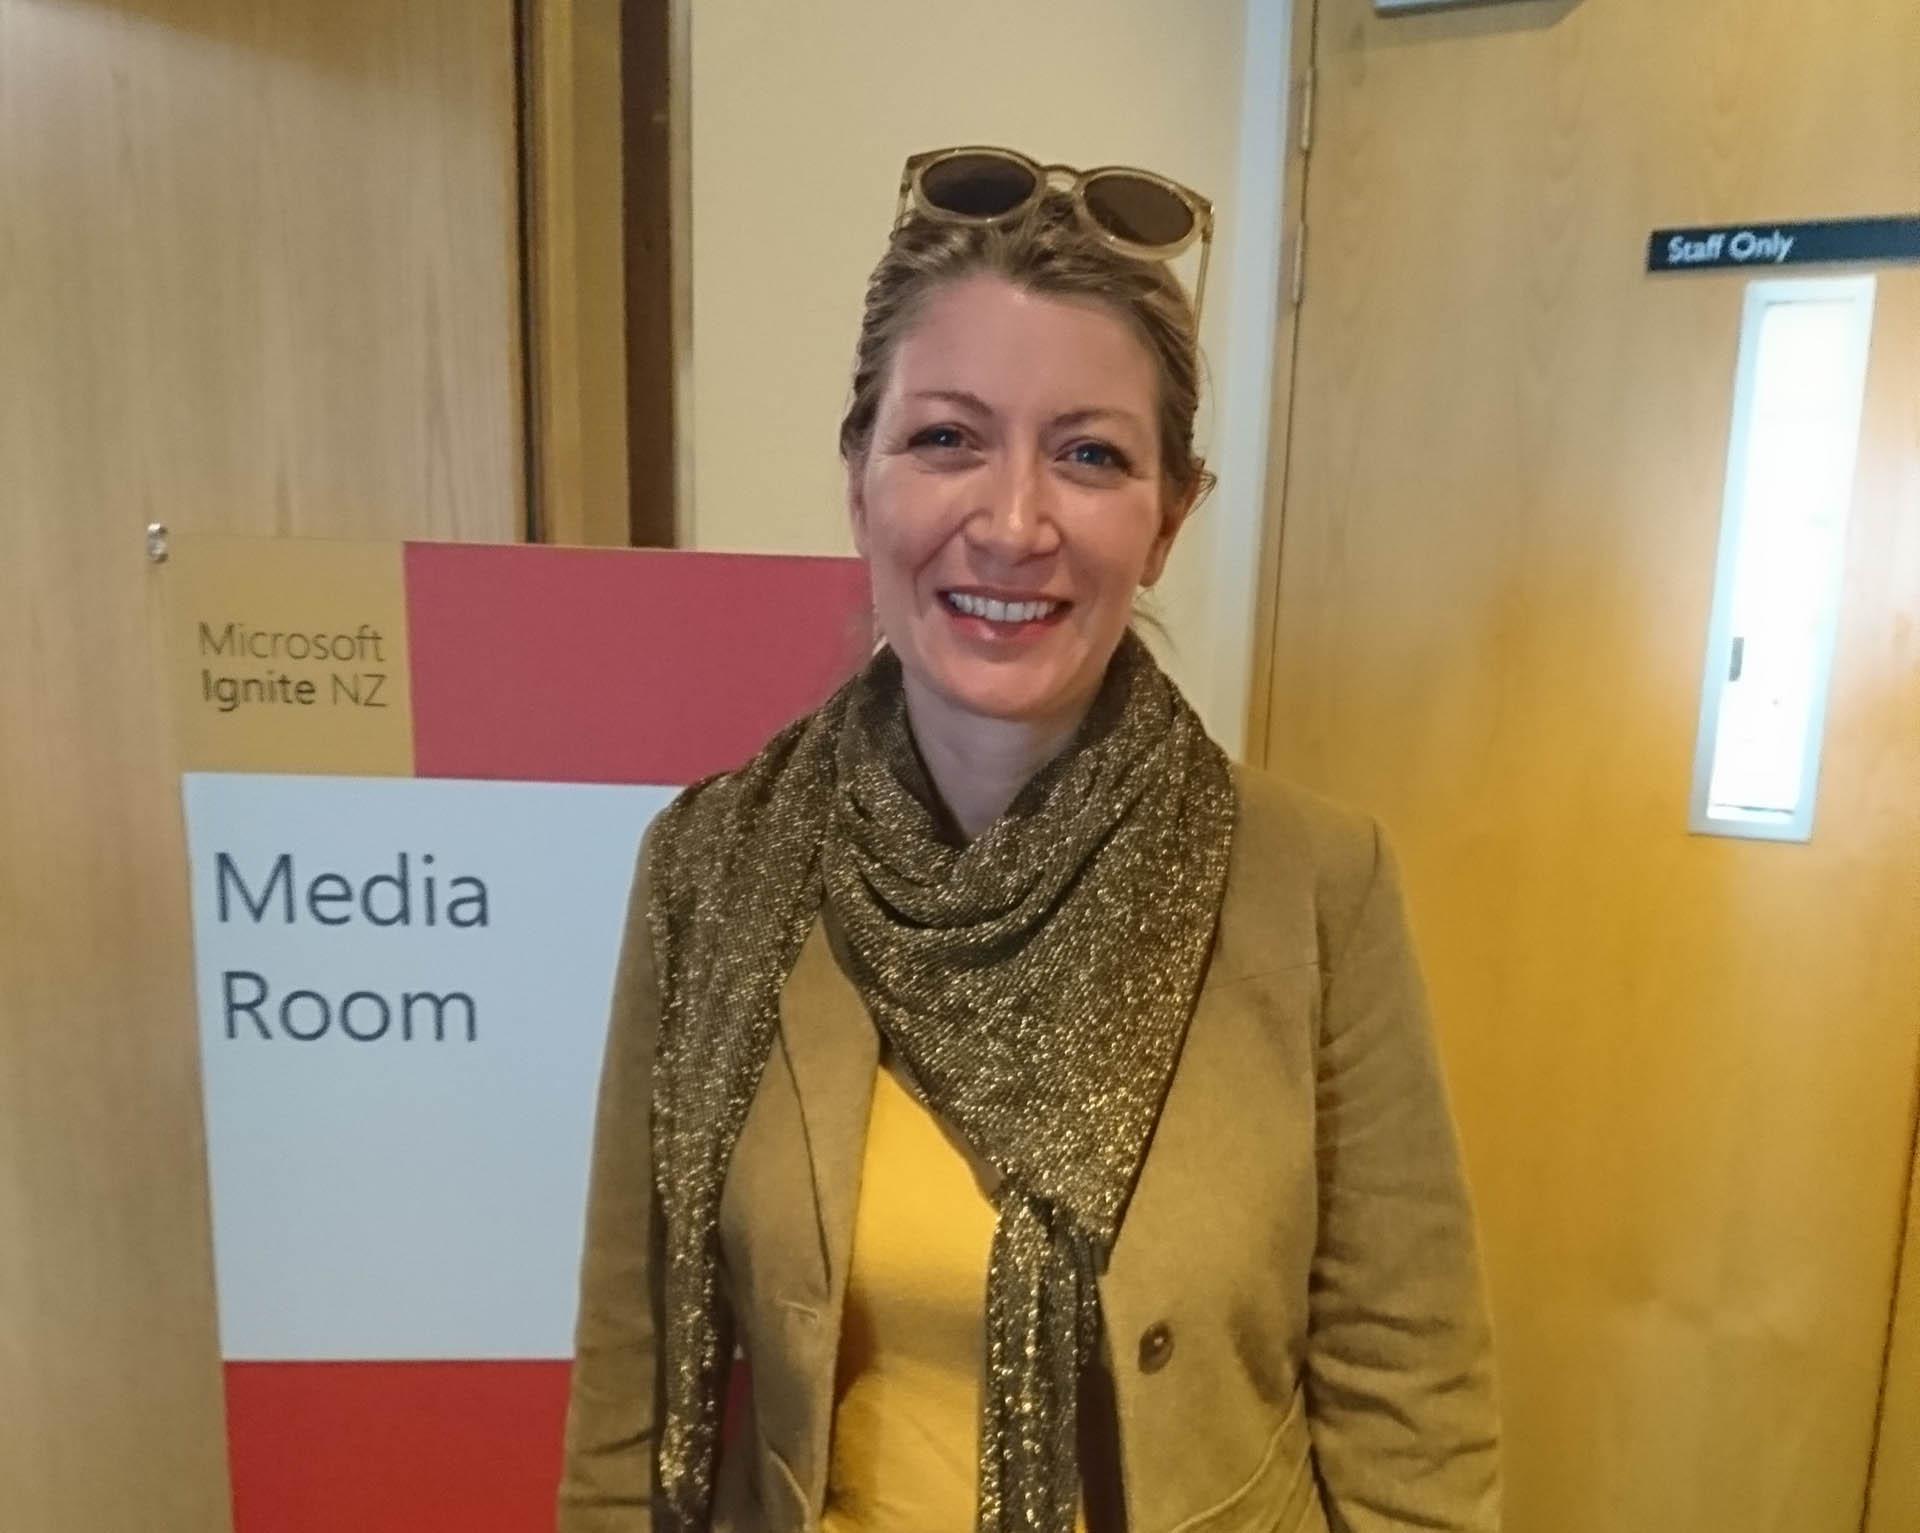 Melanie Langlotz - GEO AR Games Co-Founder